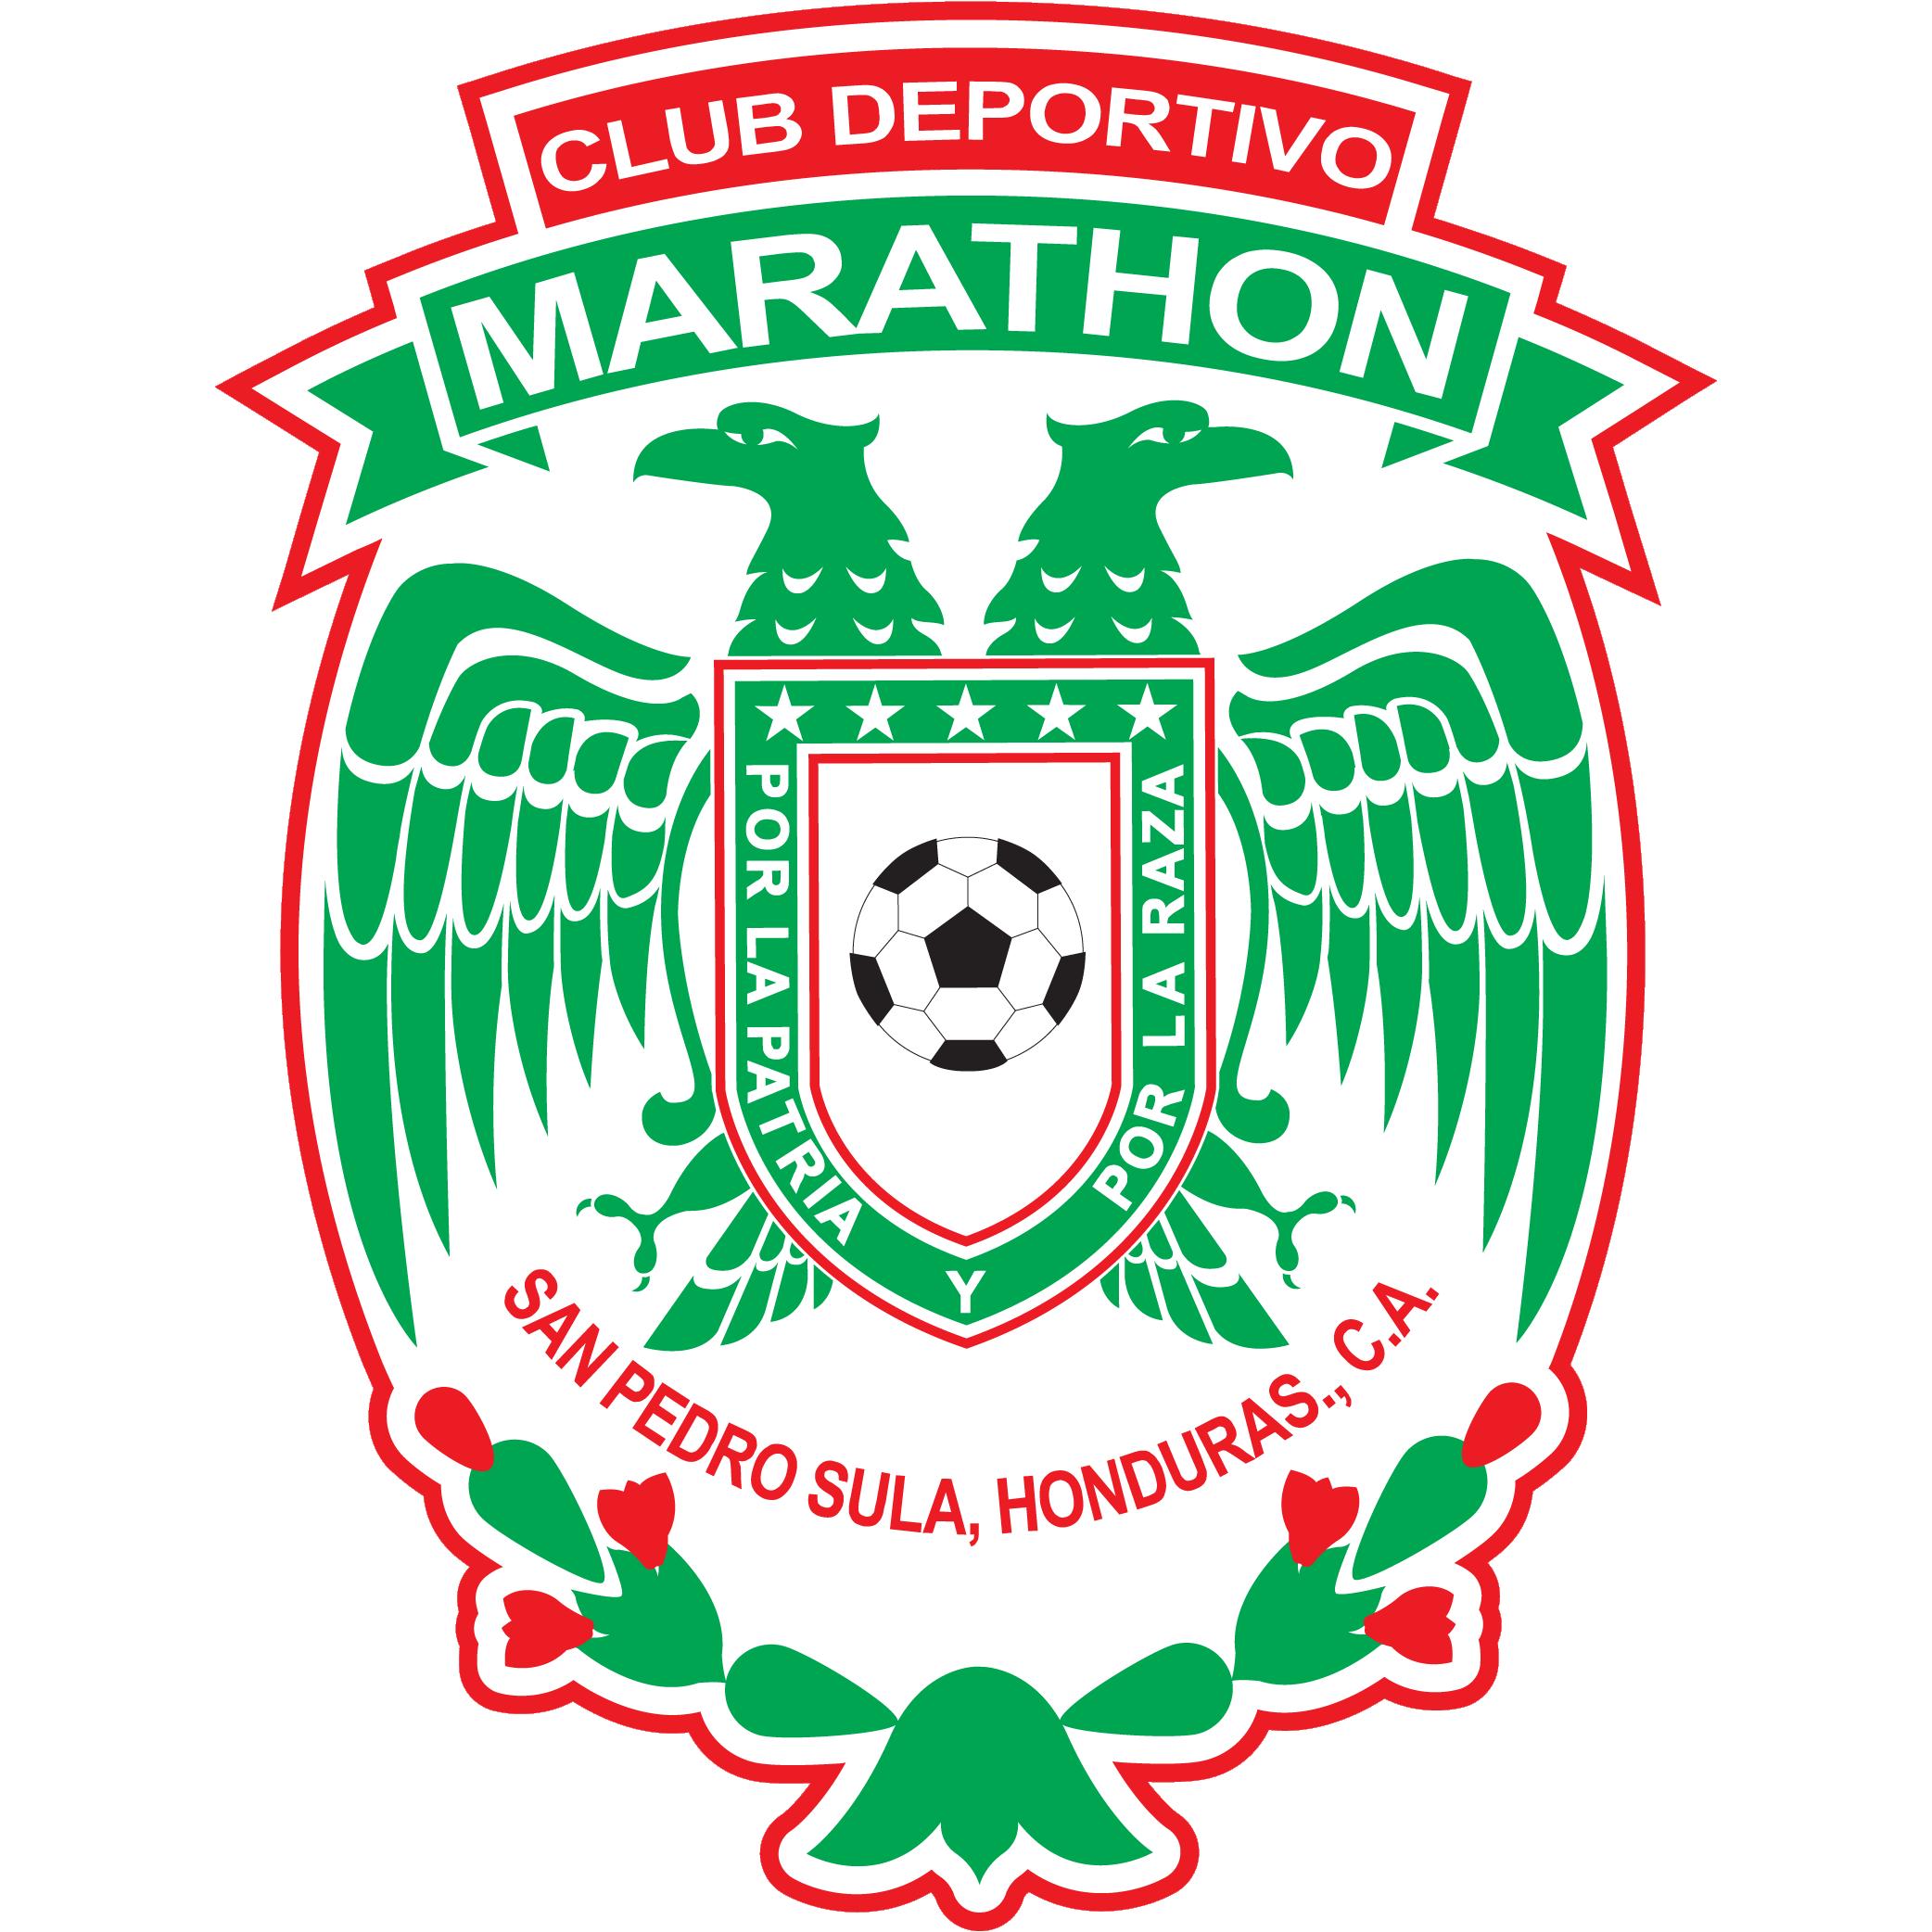 hon_-_marathon.png